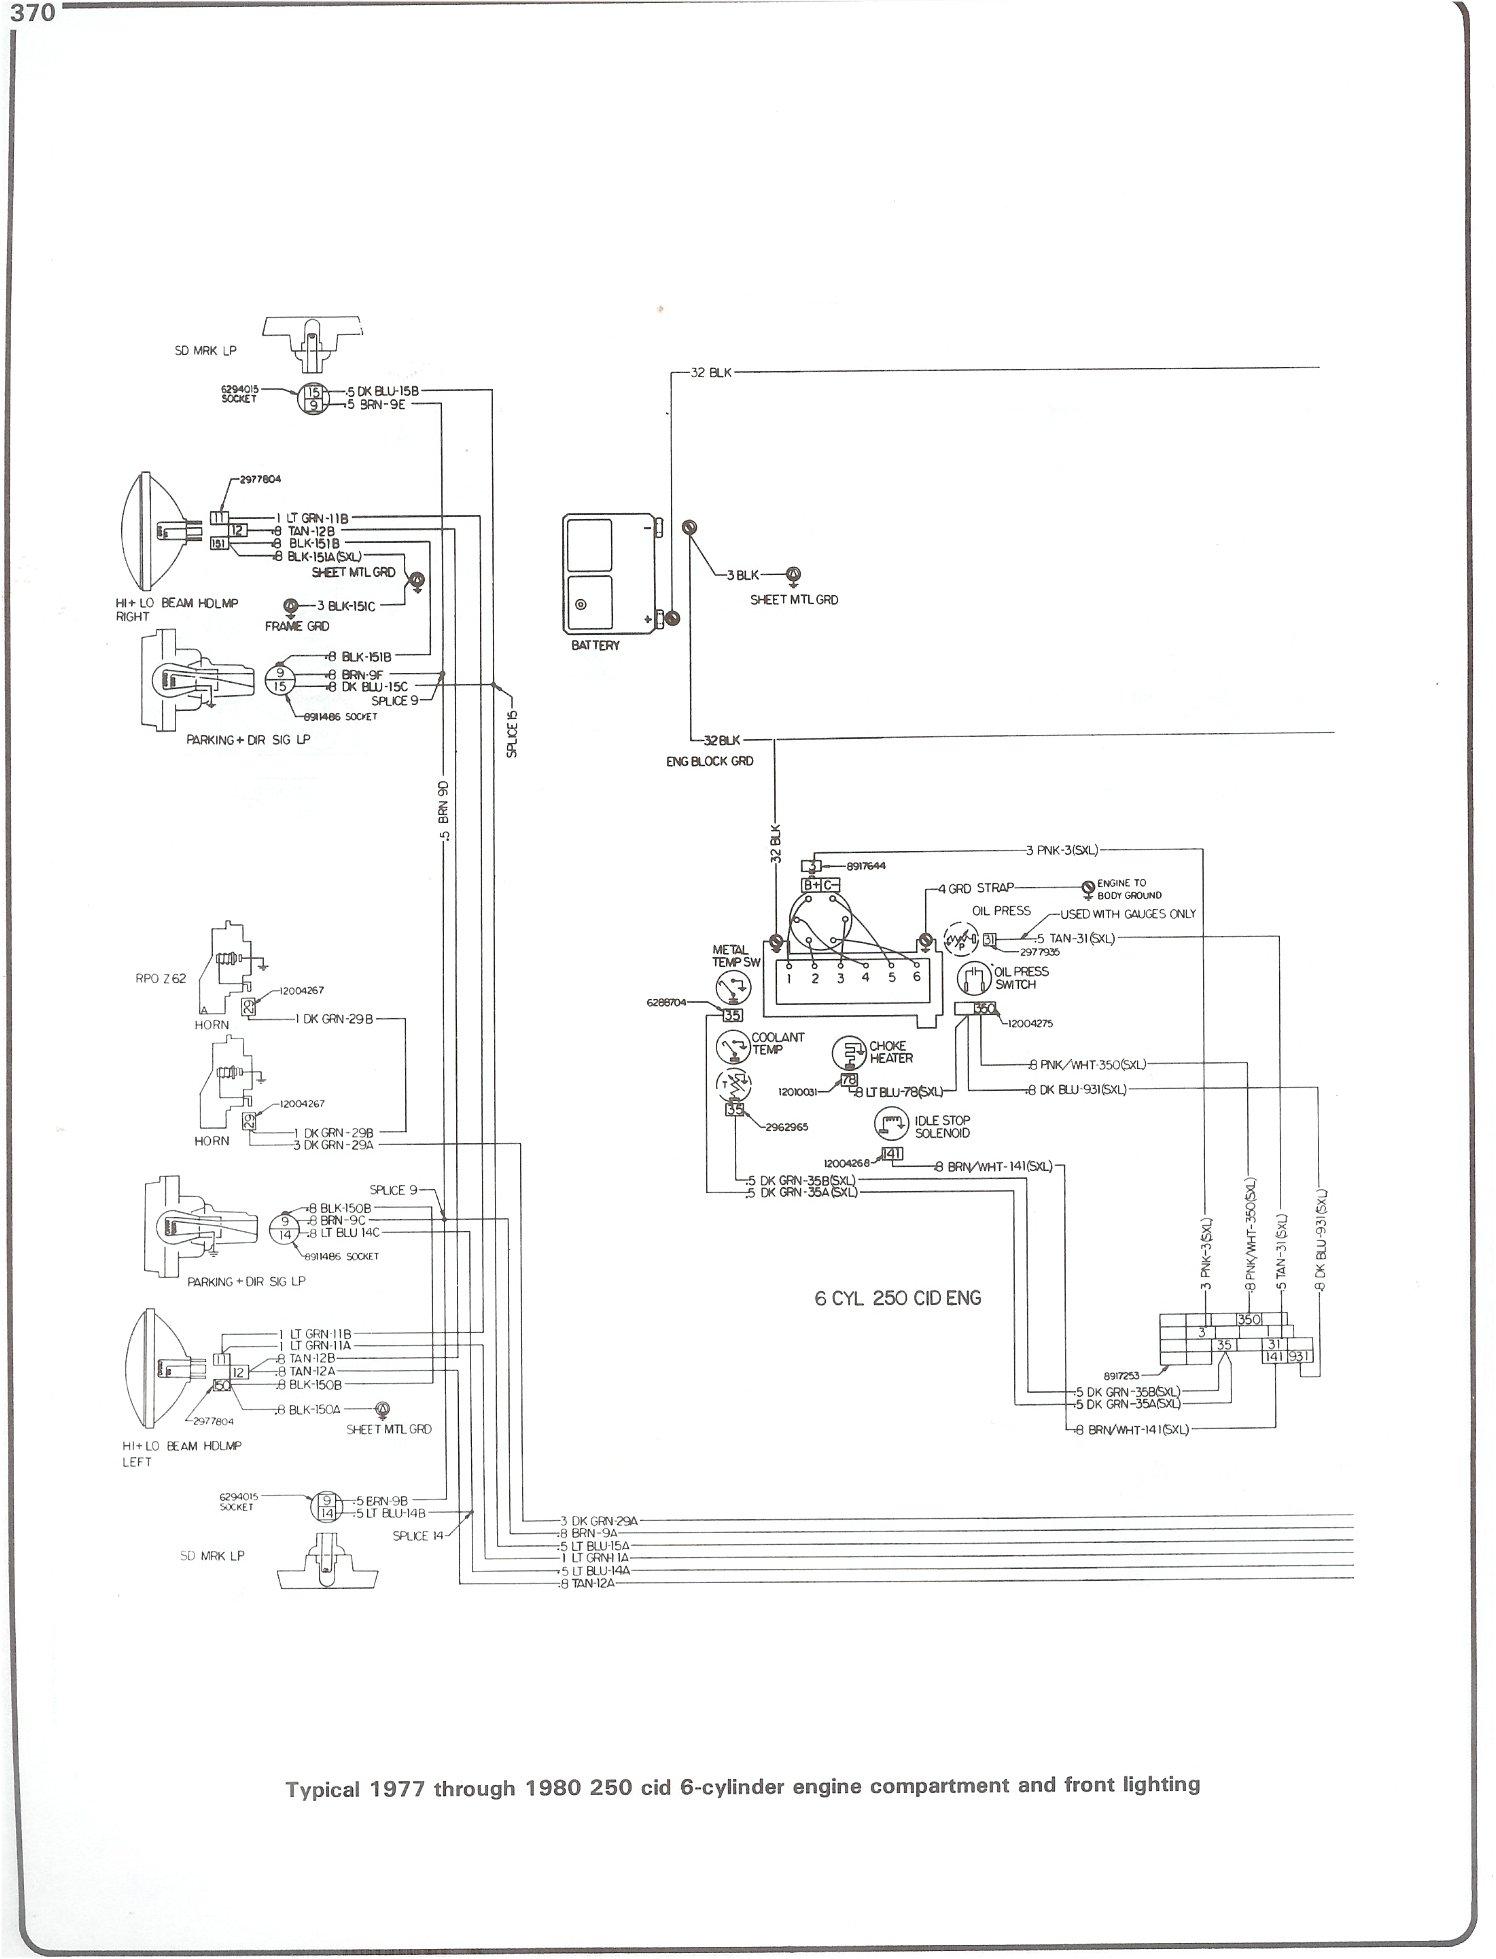 Brilliant 1976 Chevy Truck Wiring Schematic Basic Electronics Wiring Diagram Wiring Cloud Biosomenaidewilluminateatxorg